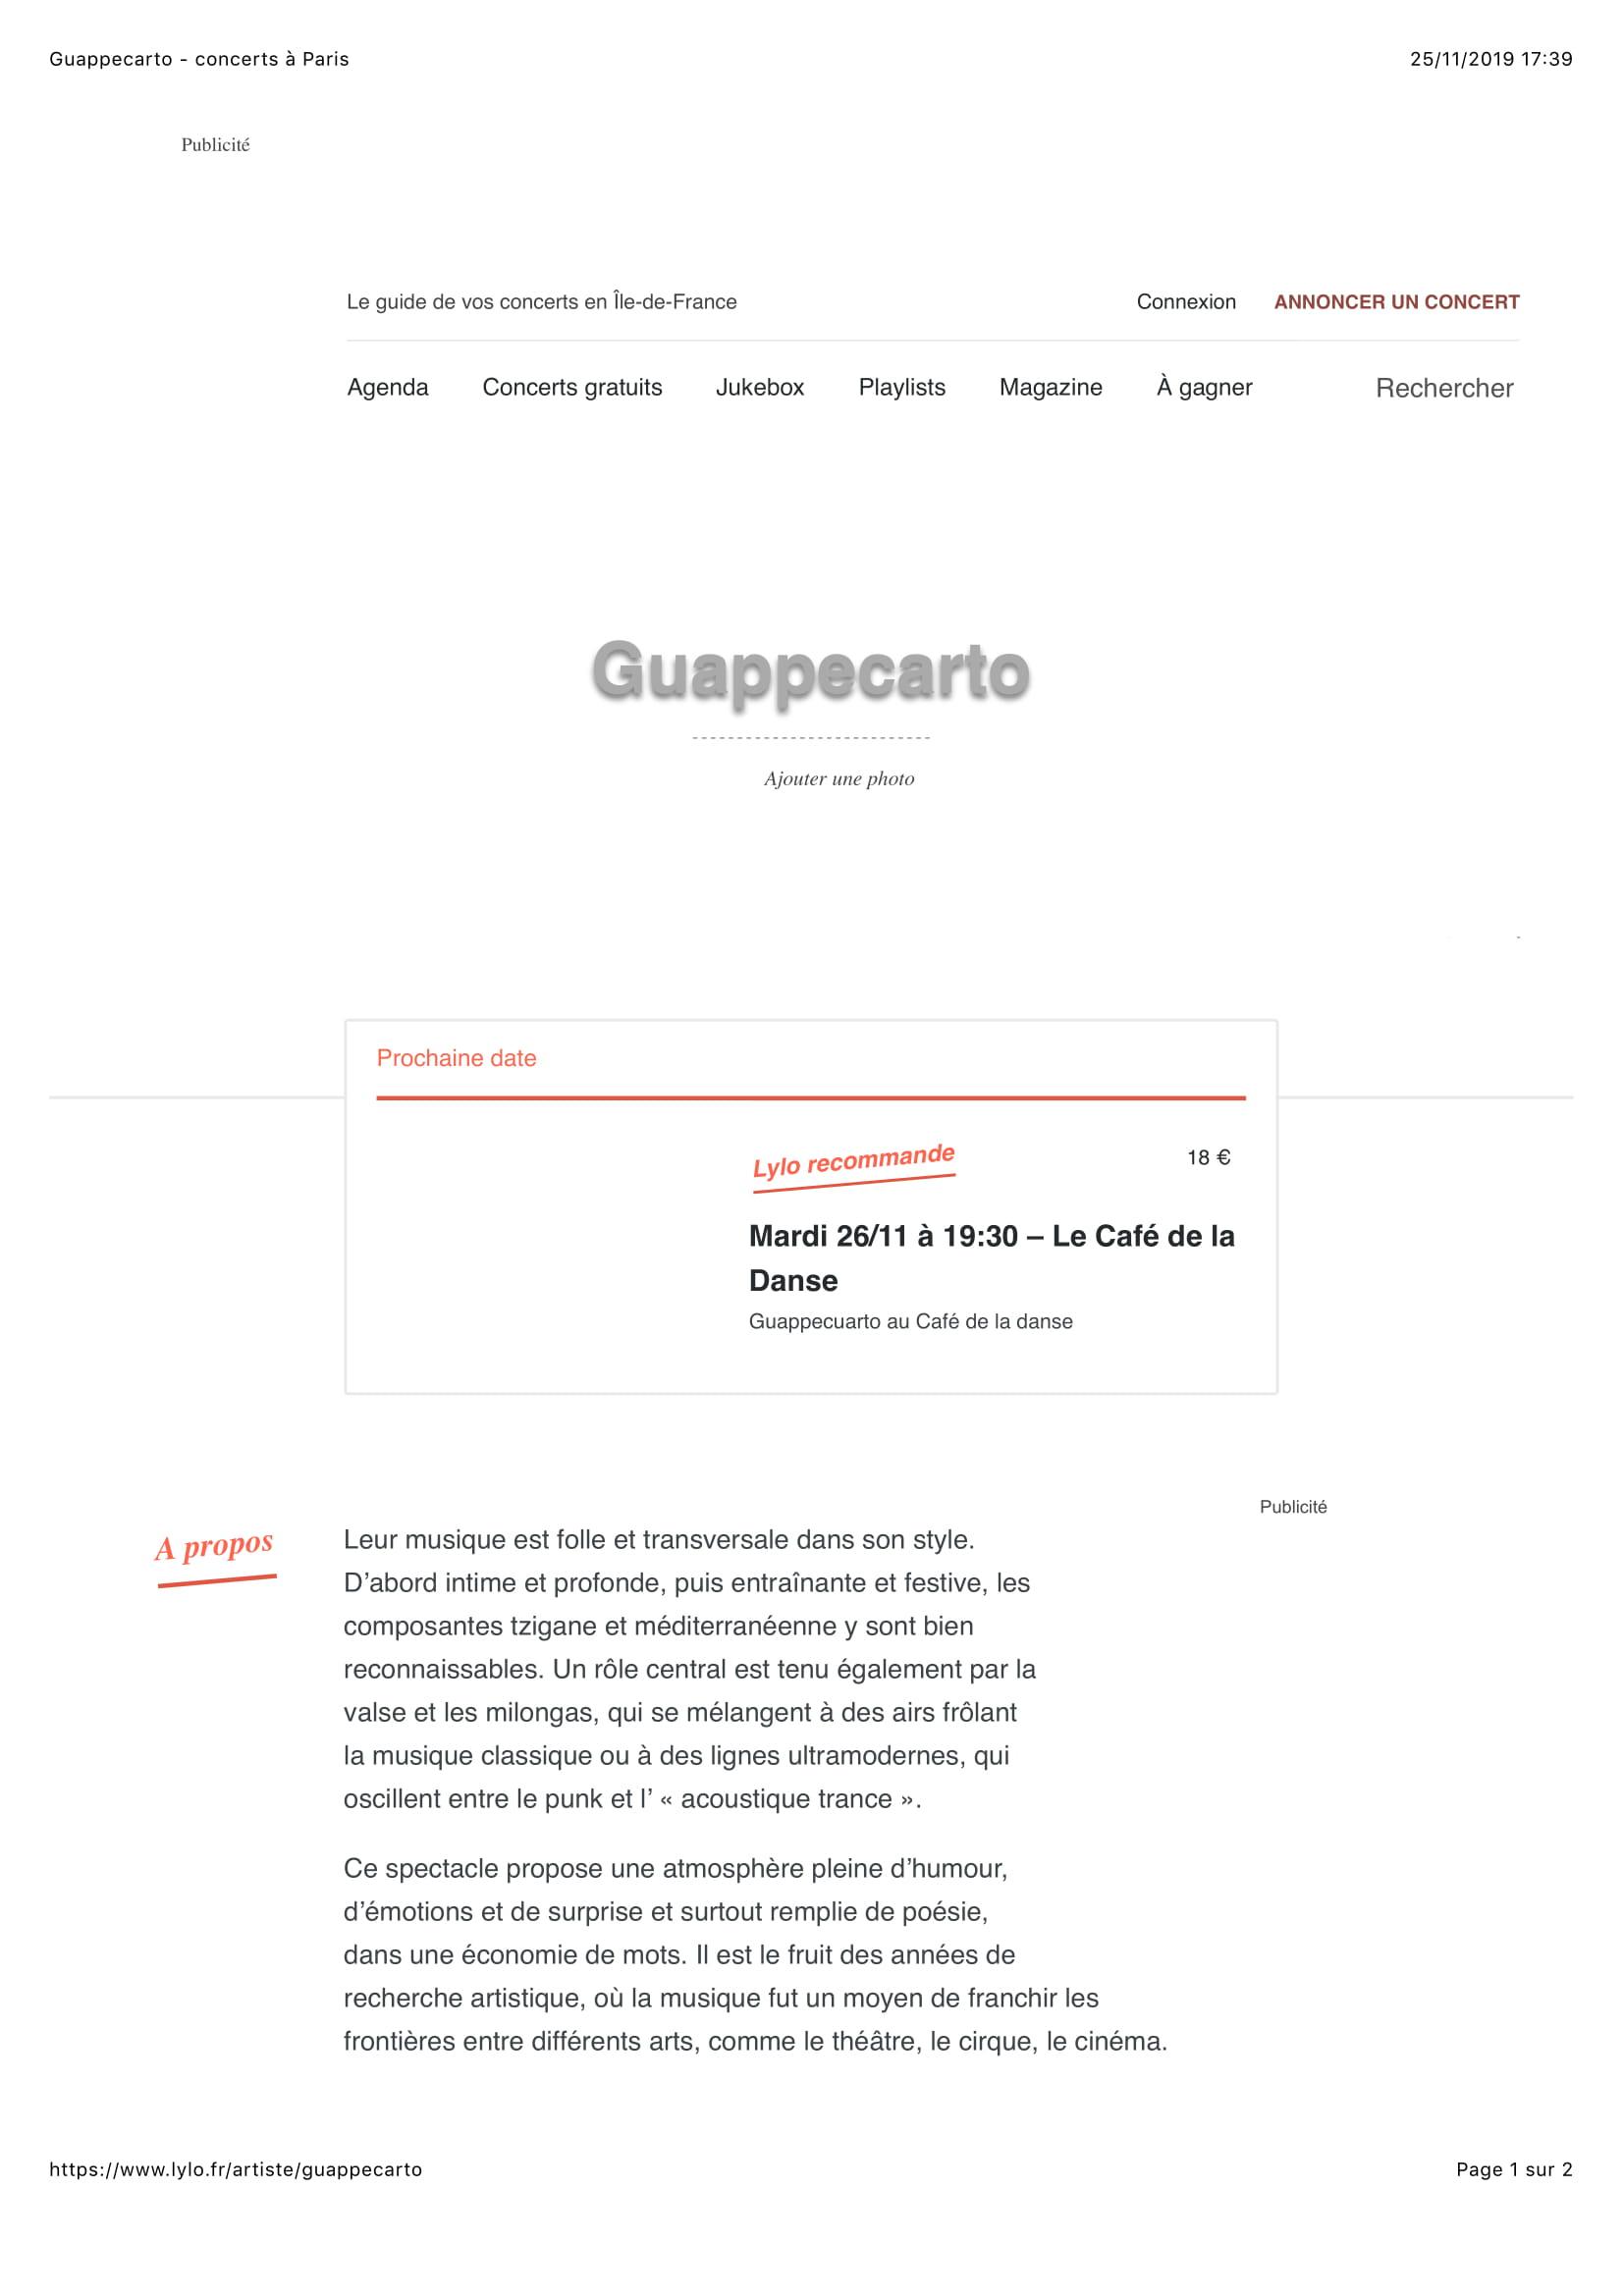 Guappecarto Revue de presse